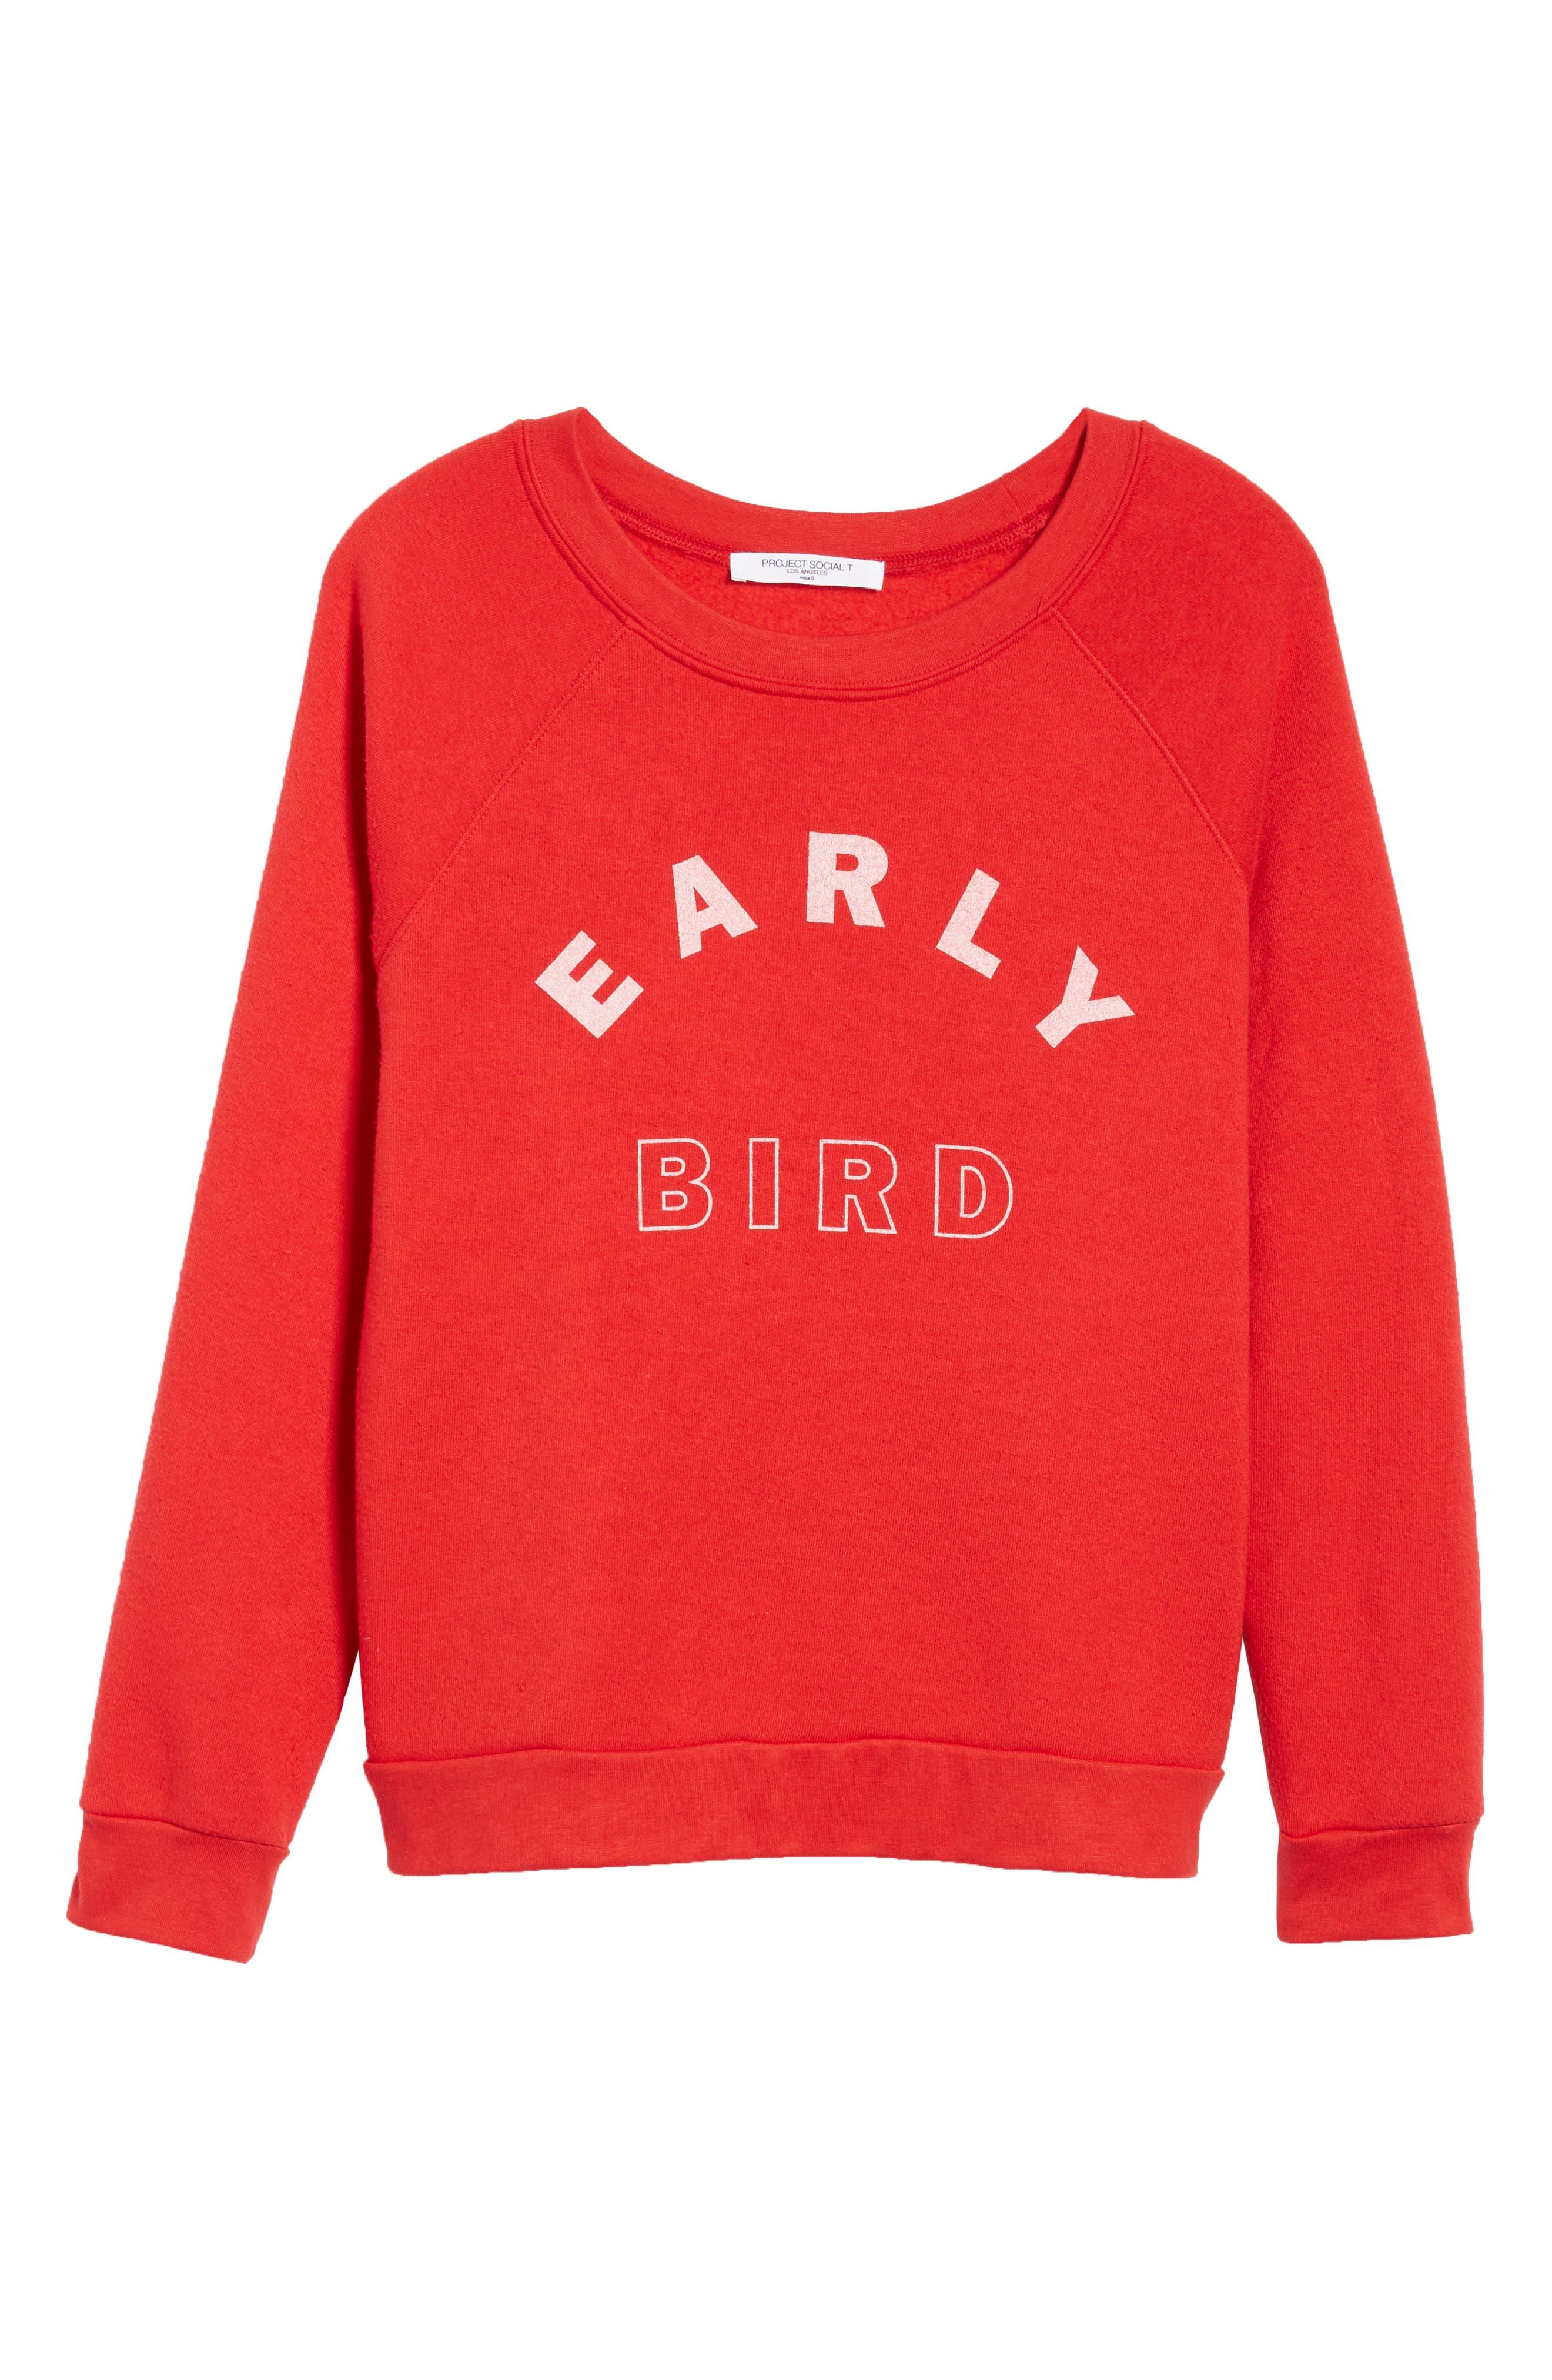 Reversible Sweatshirt,                             Alternate thumbnail 8, color,                             Red